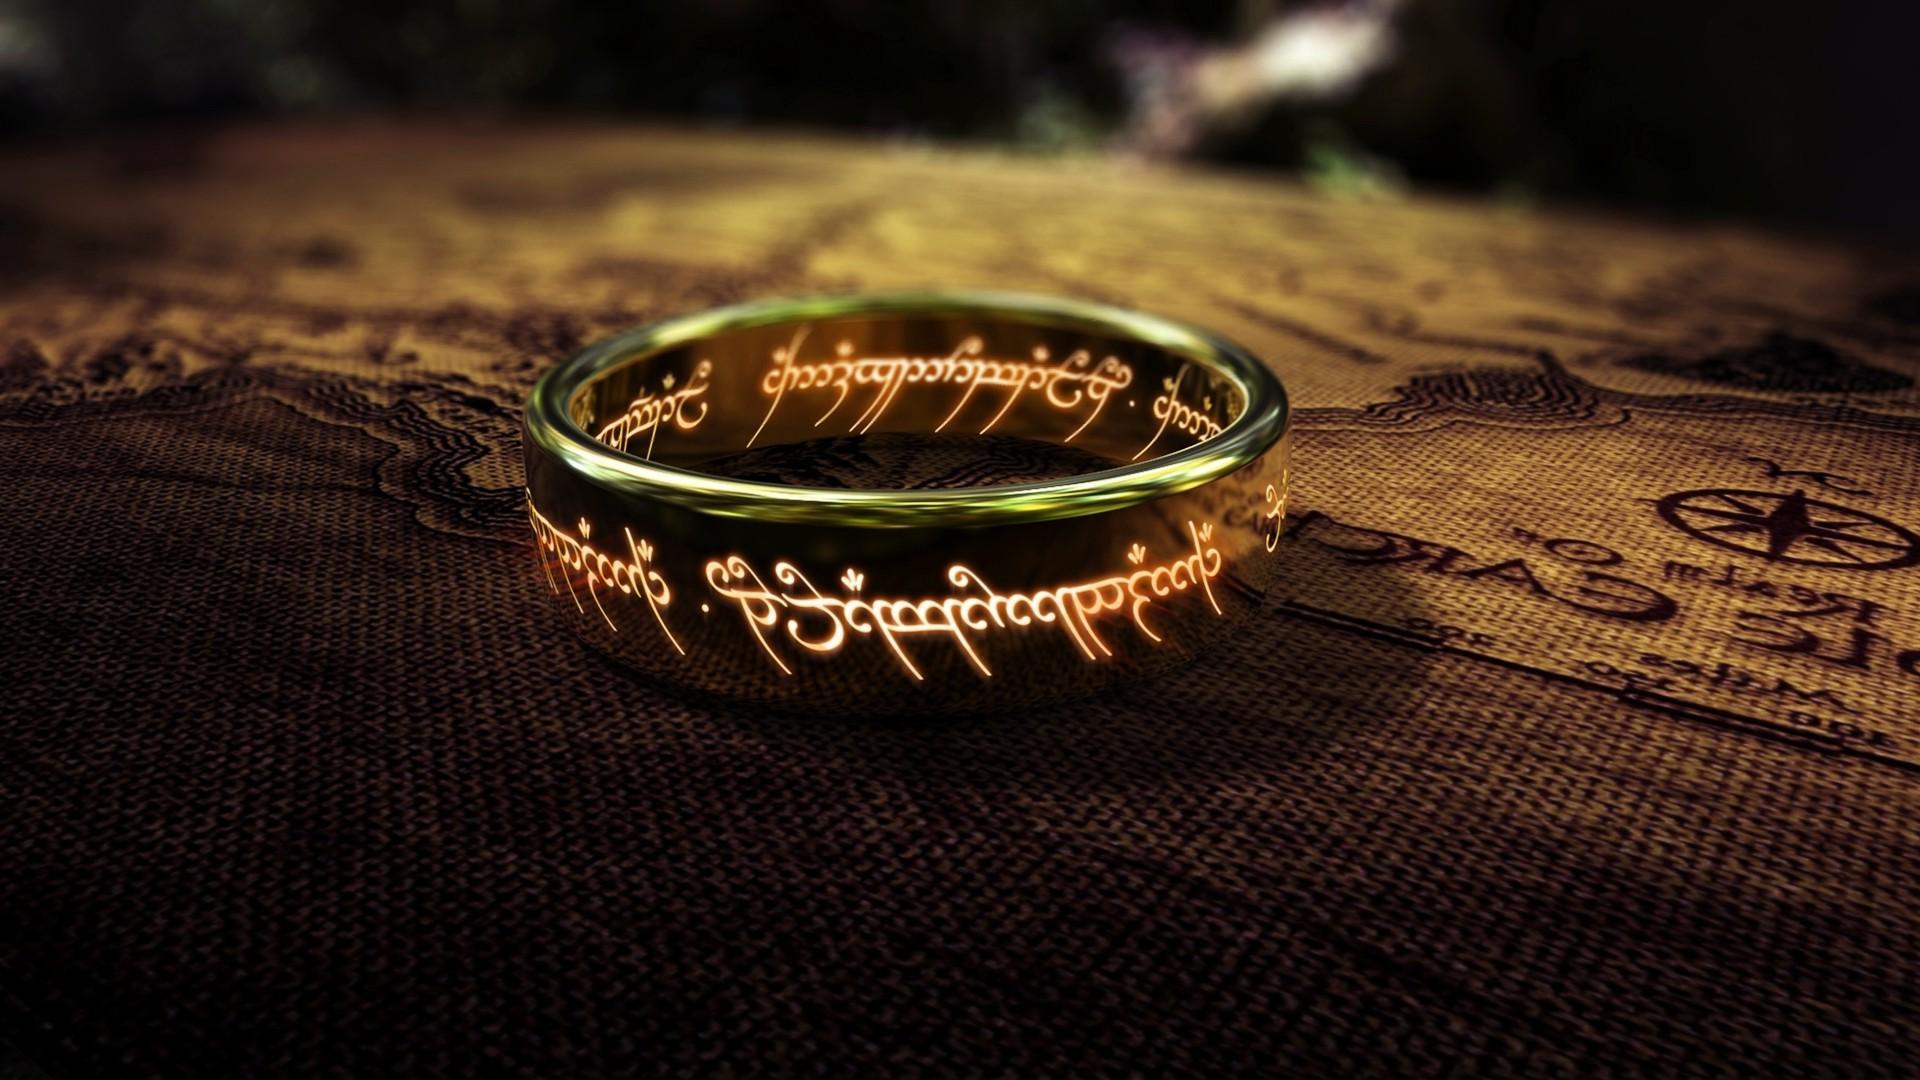 Lord Of The Rings Wallpapers Desktop | PixelsTalk.Net